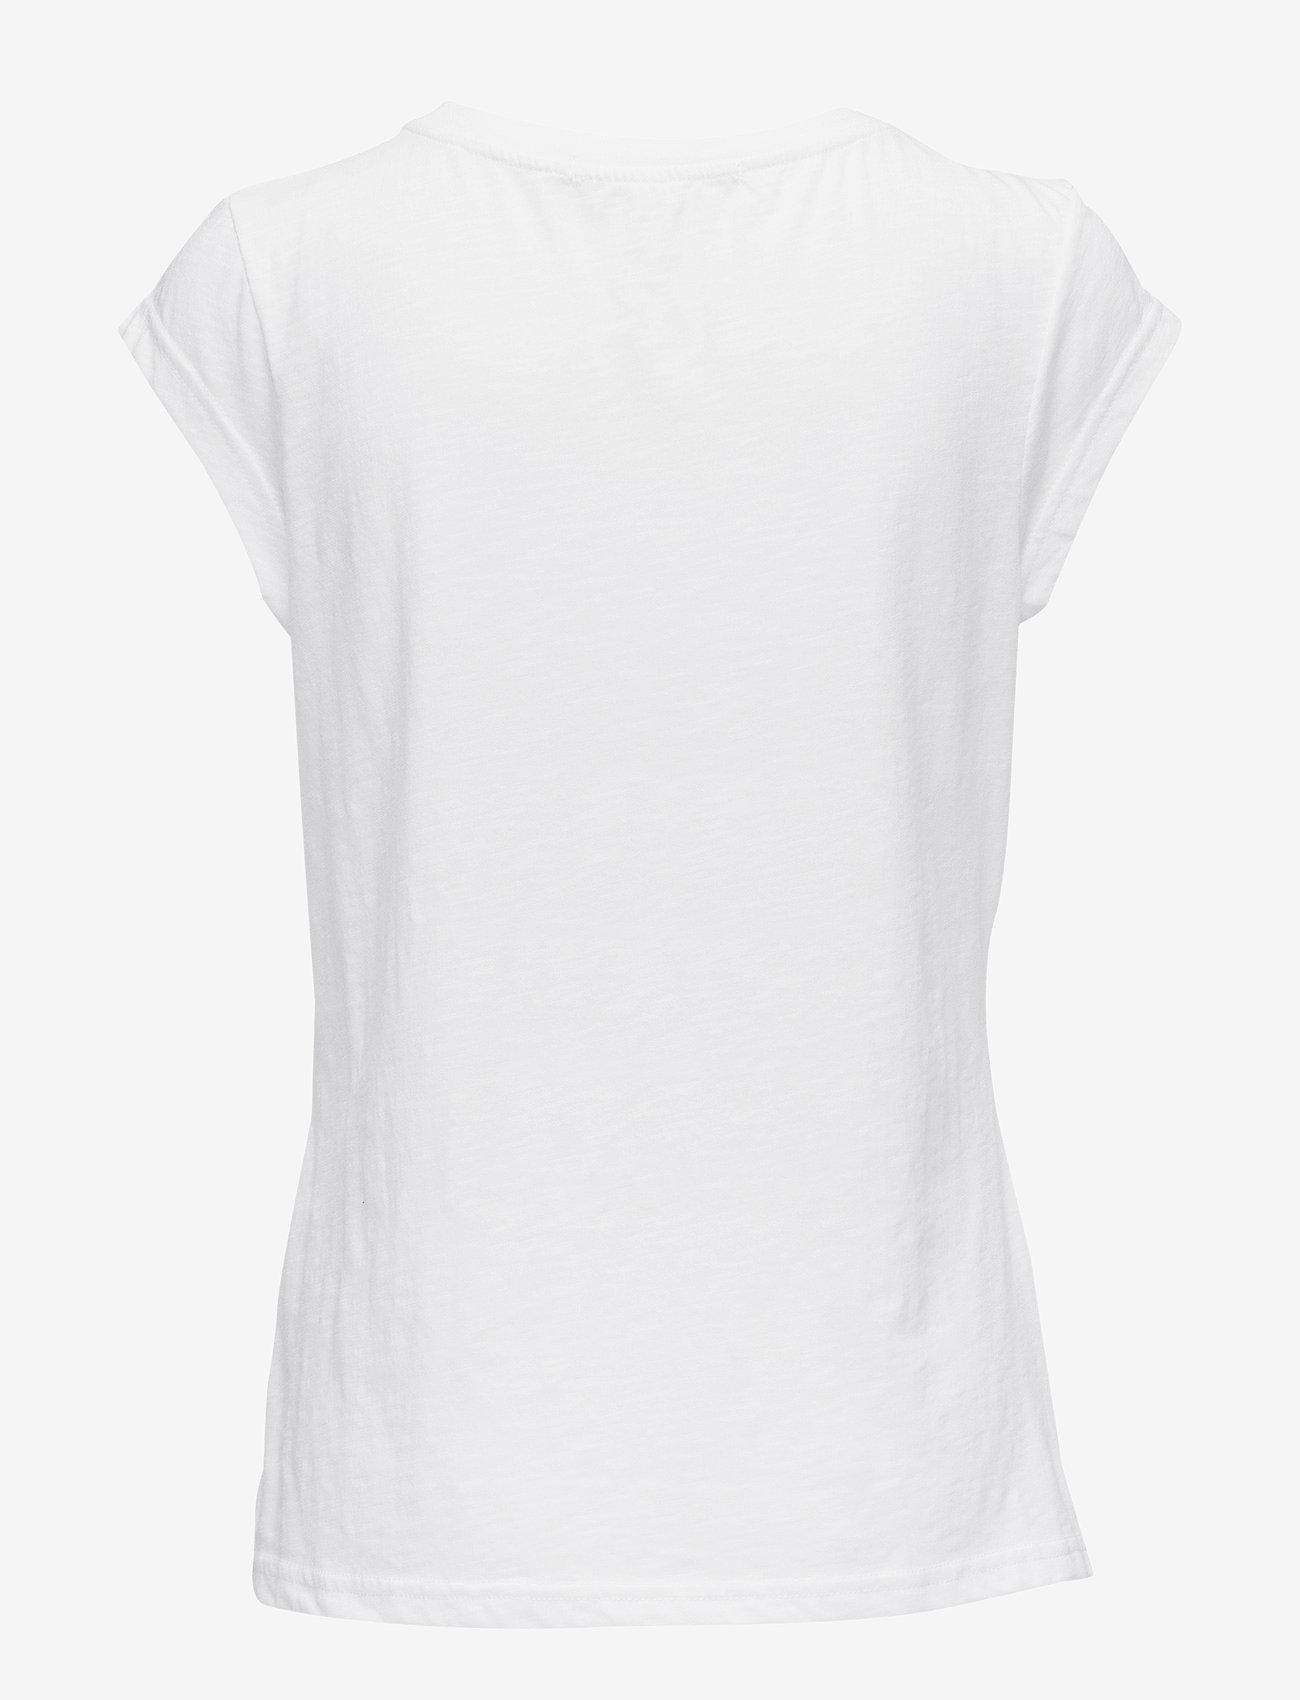 Coster Copenhagen - CC Heart basic t-shirt (B0017) - t-krekli - white - 1